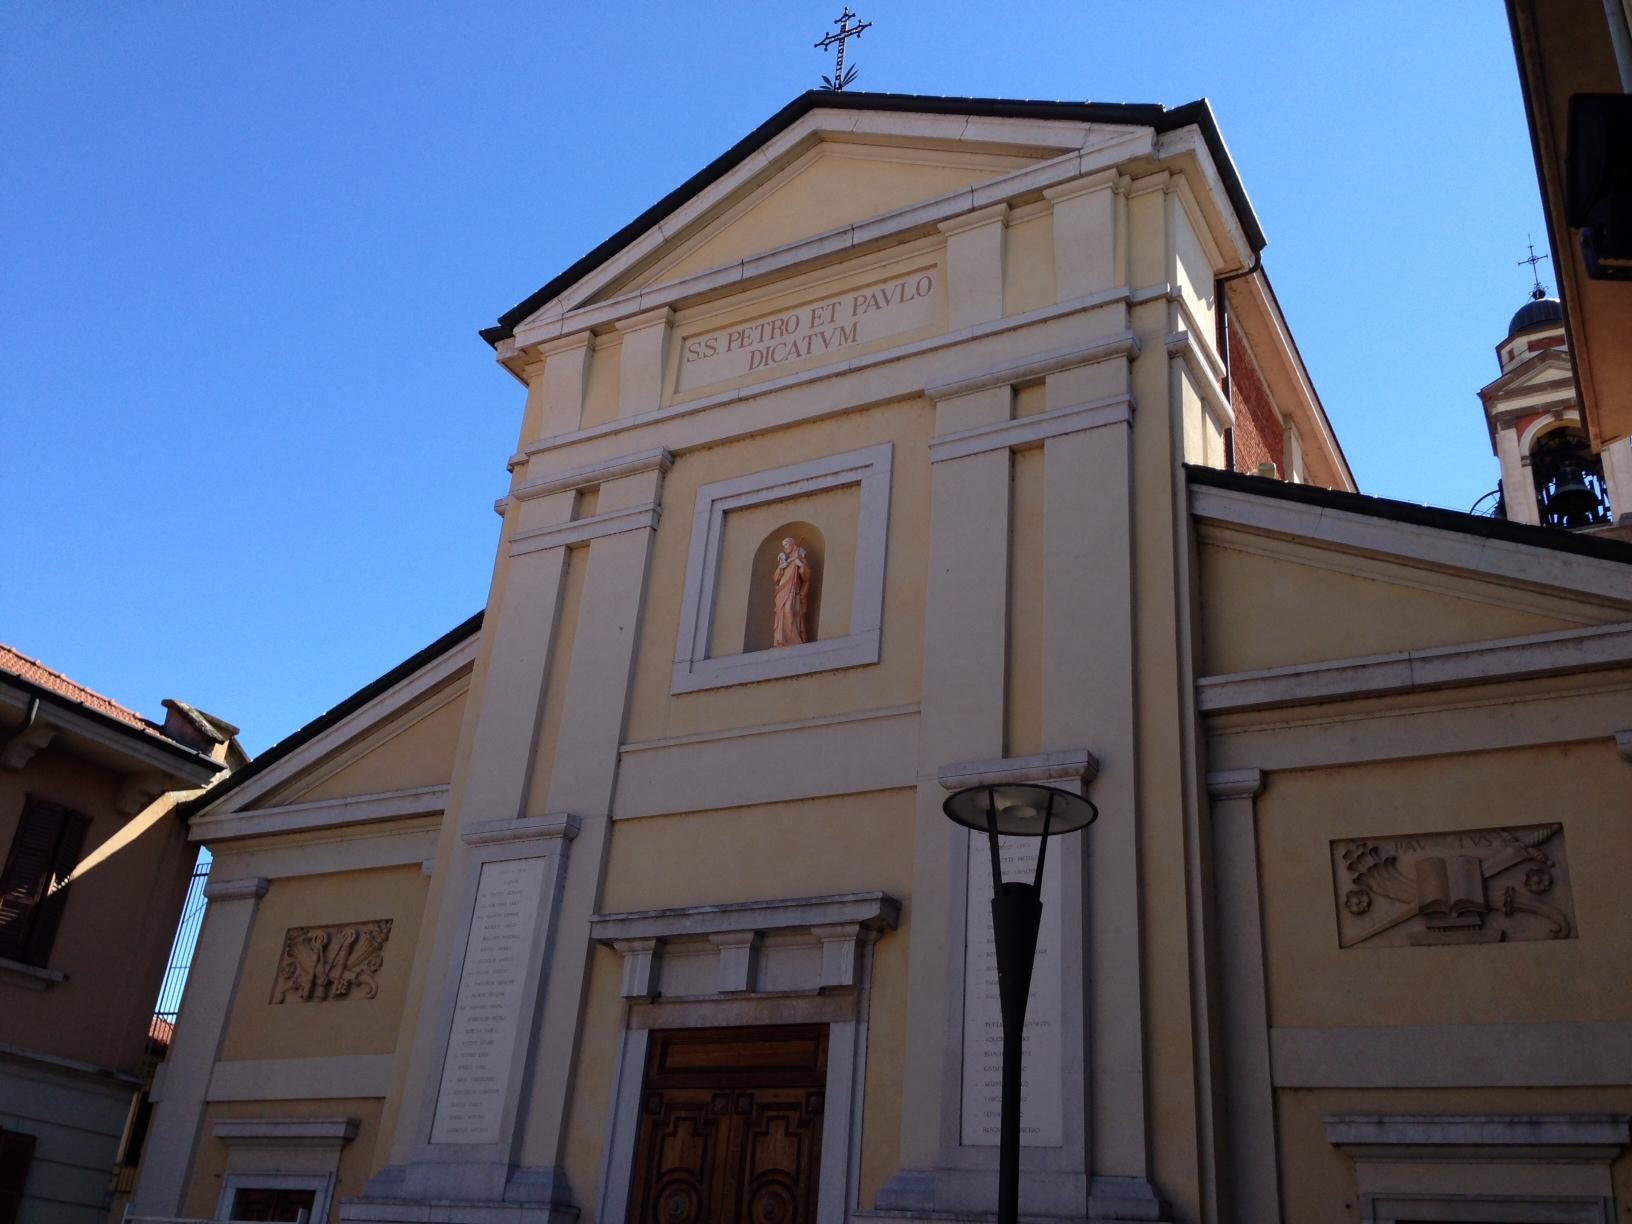 Chiesa Arese SS. Pietro e Paolo, Mi